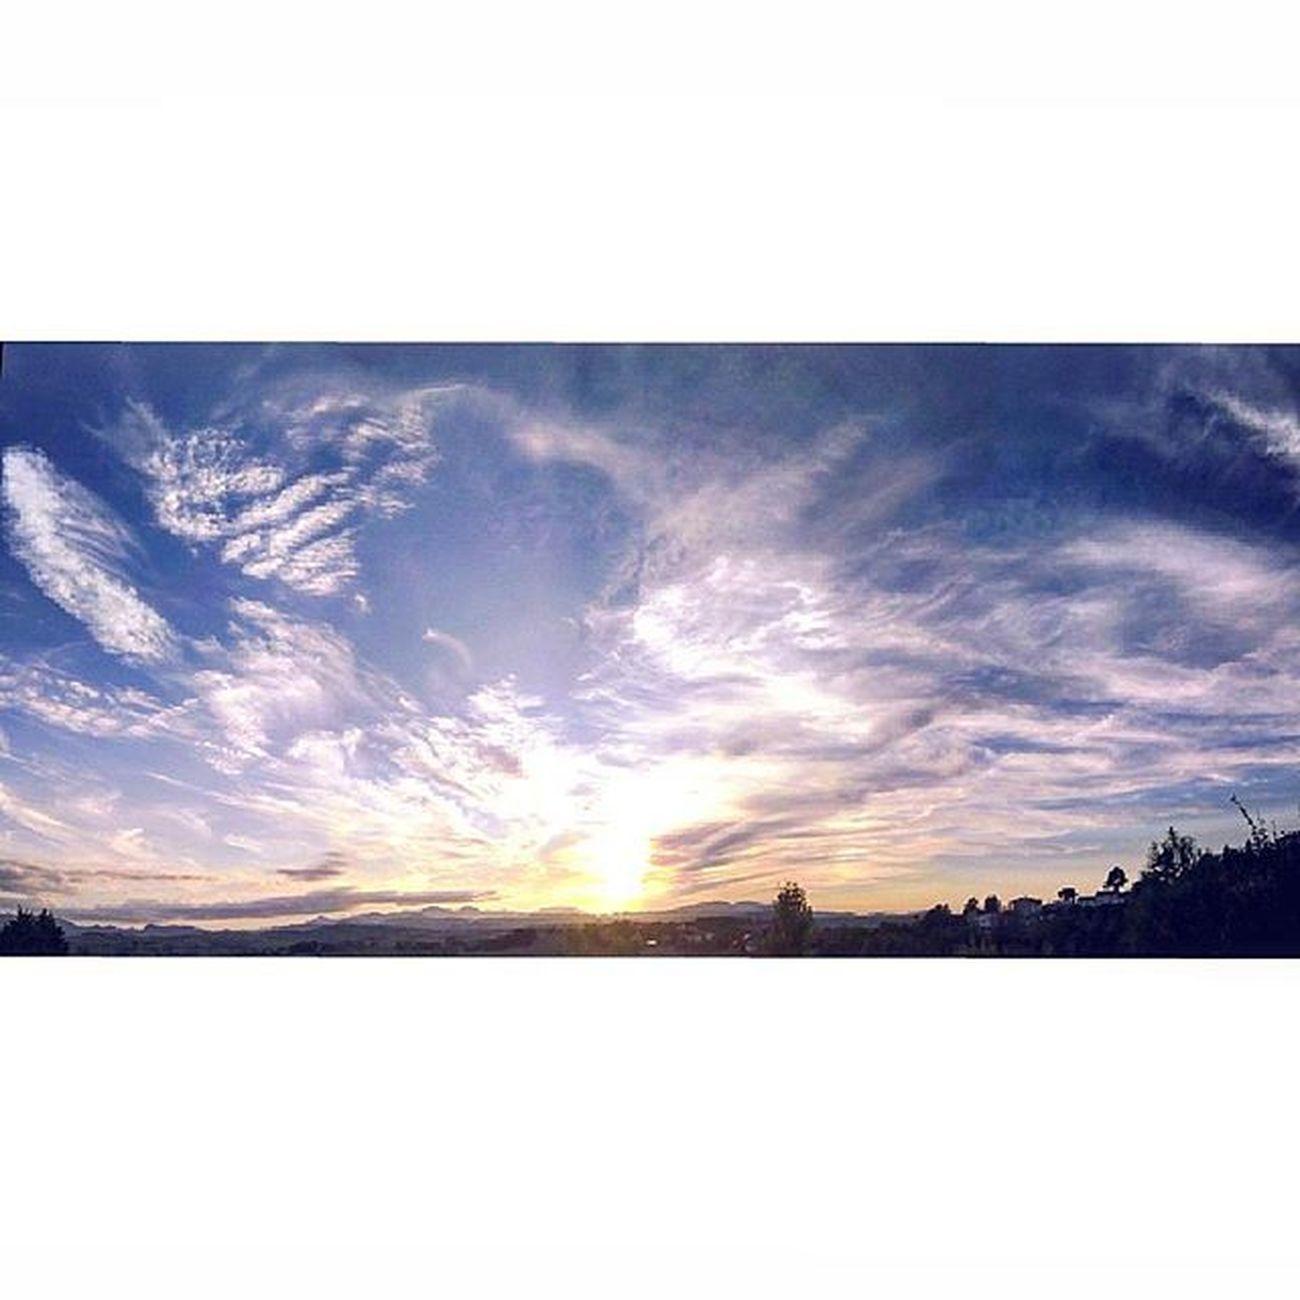 ☀ Sunset Sun Sunlight Landscape Orizzonte Cielo Sky Skylovers SkyClouds Clouds Cloudslovers Cloudscape Natura Nature Naturelovers Marcheforyou Marche Italy Italia Liveloveitalia Igersmarche Igersitalia Tramonto